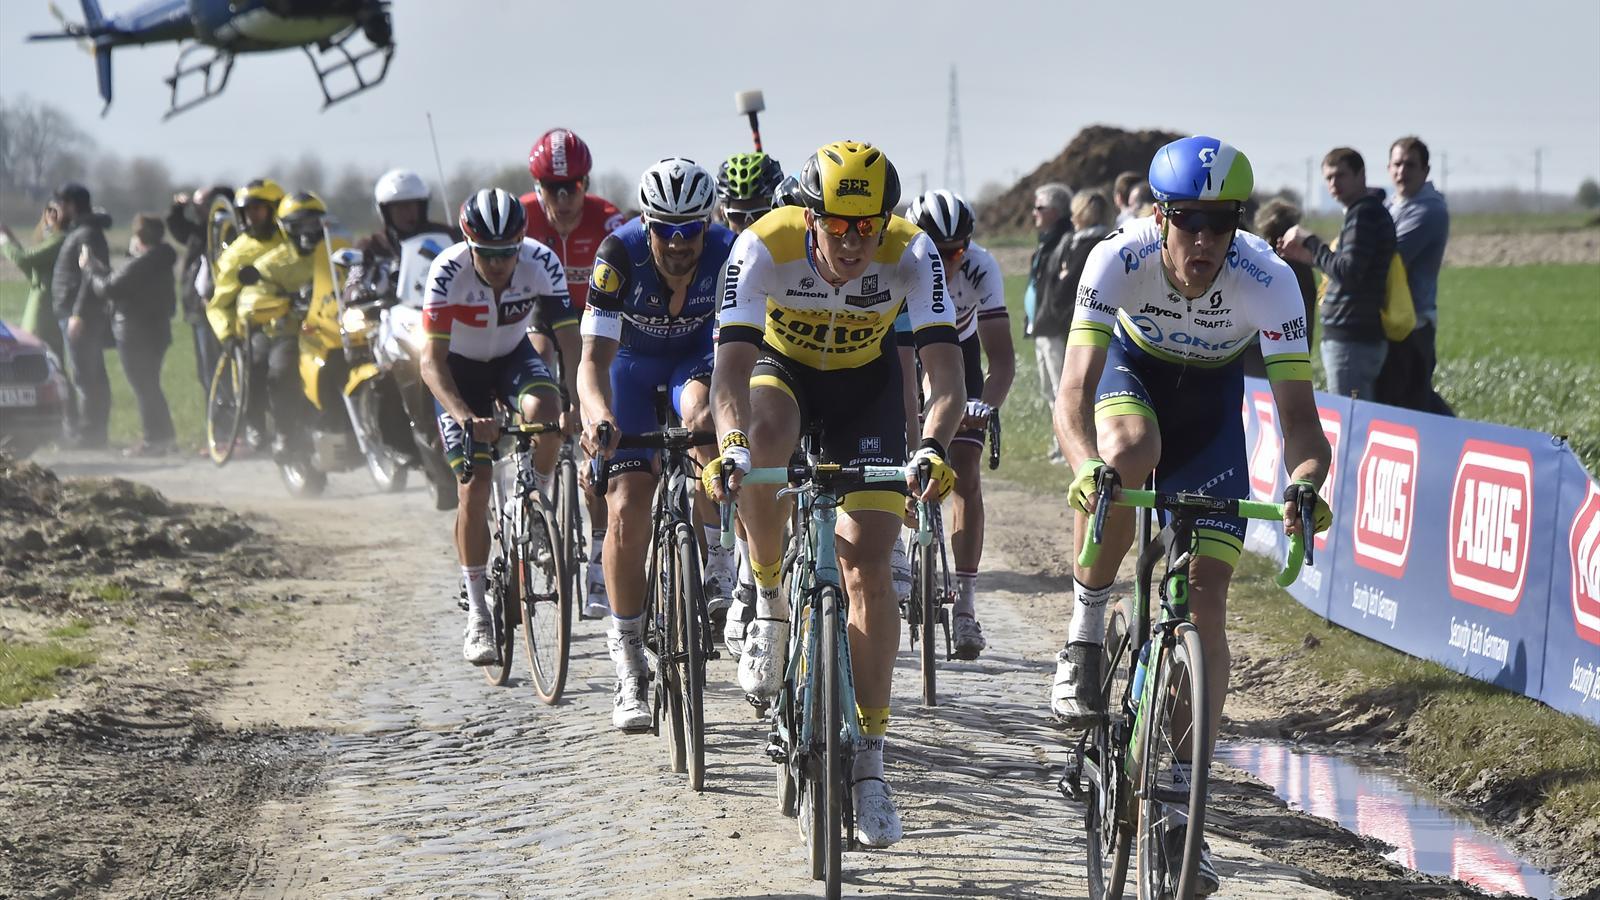 Paris-Roubaix preview: date, time, route, odds and TV schedule - Paris - Roubaix 2017 - Cycling ...